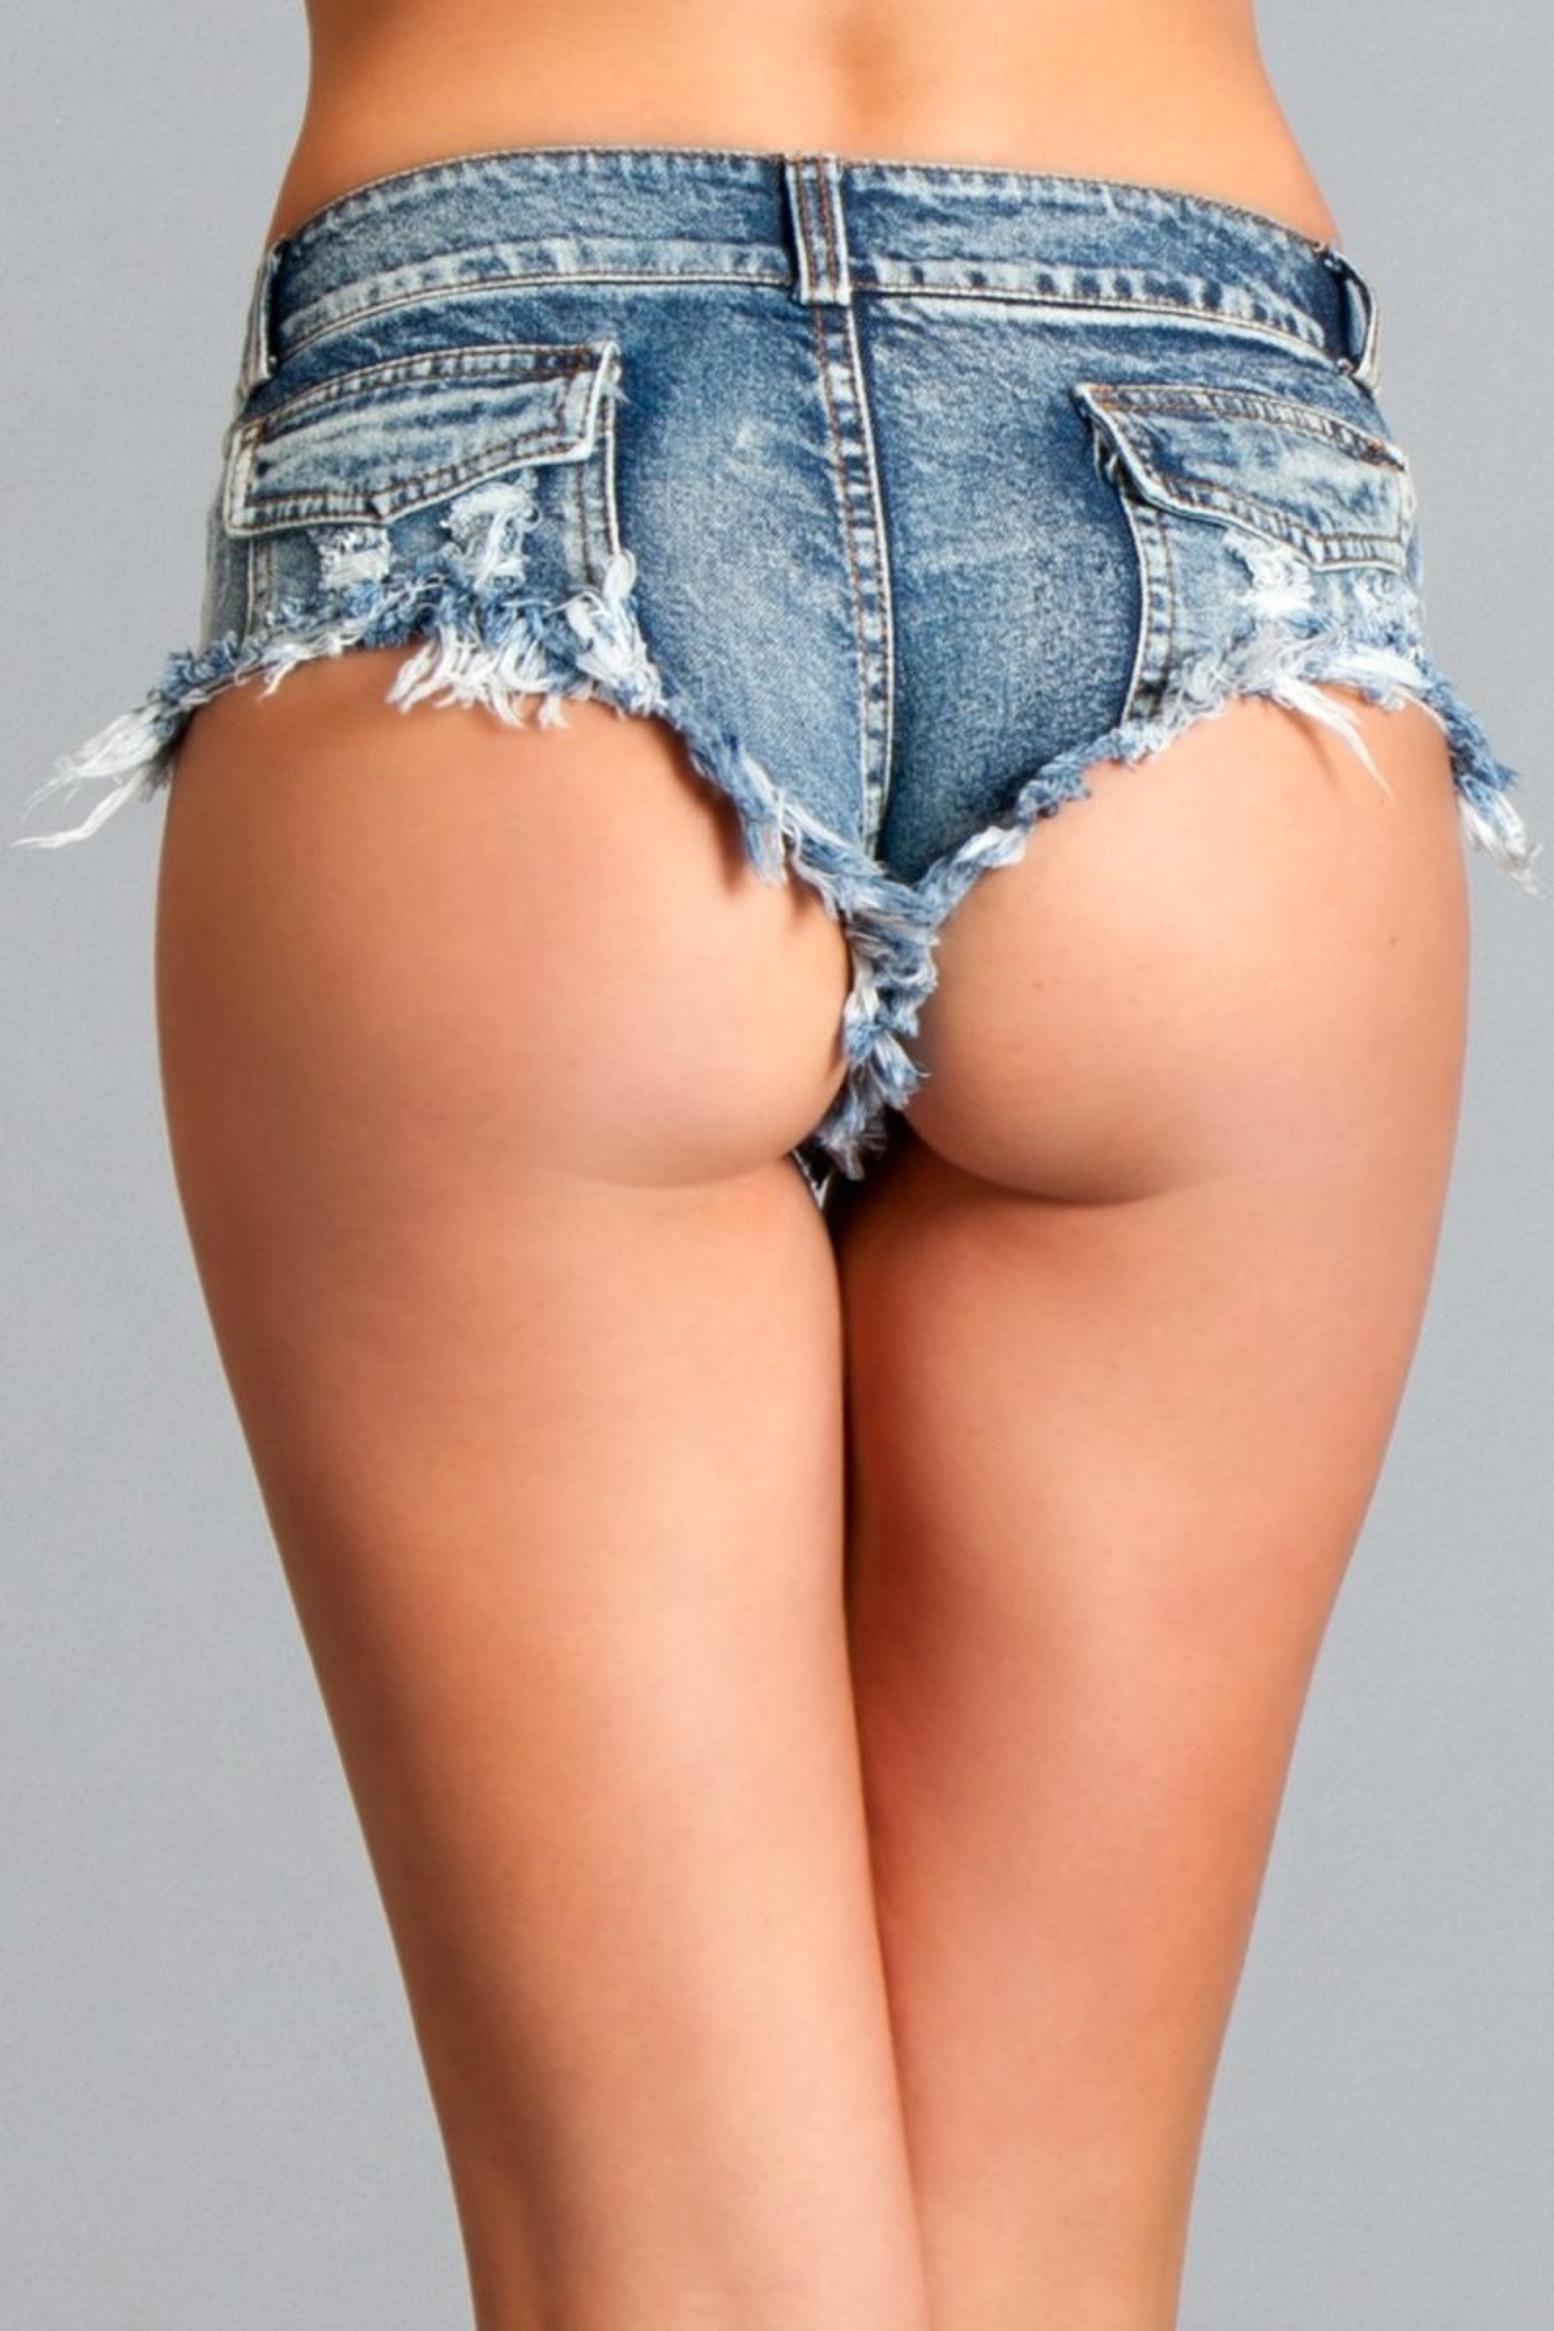 BWJ1BL Back Up Booty Shorts - Medium Wash